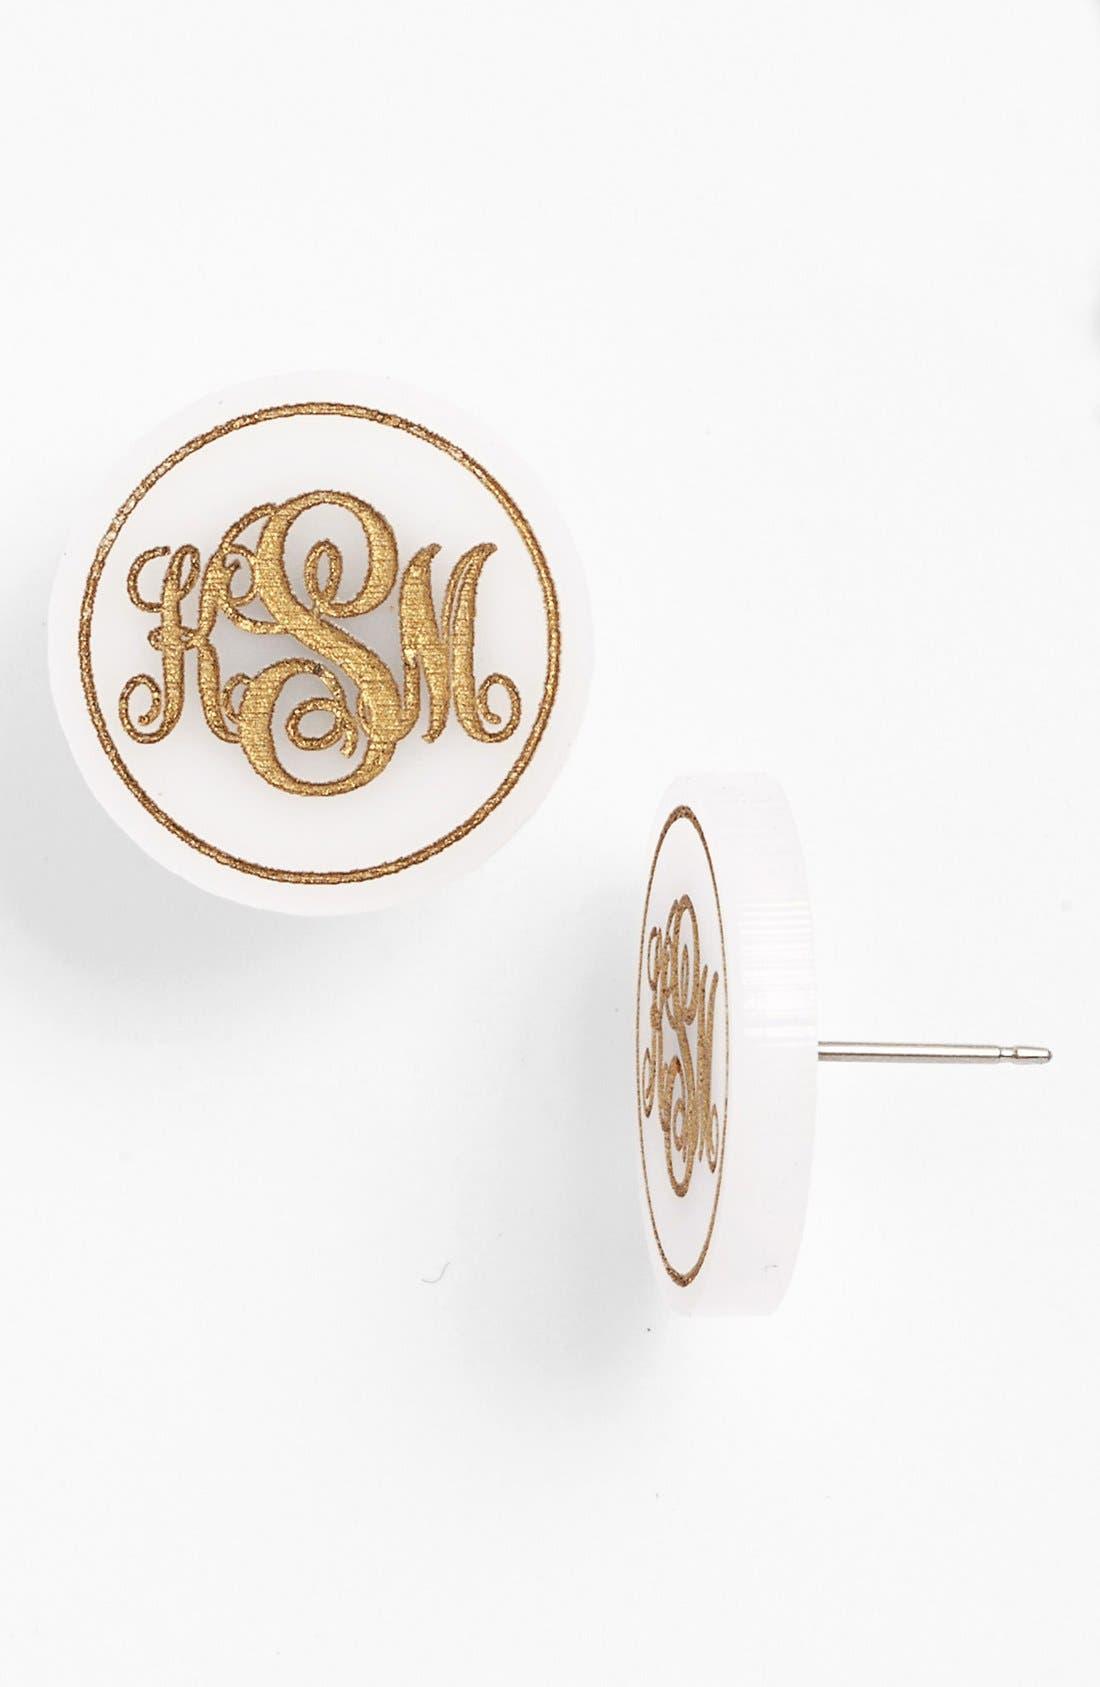 MOON AND LOLA, 'Chelsea' Medium Personalized Monogram Stud Earrings, Main thumbnail 1, color, SNOW/ GOLD